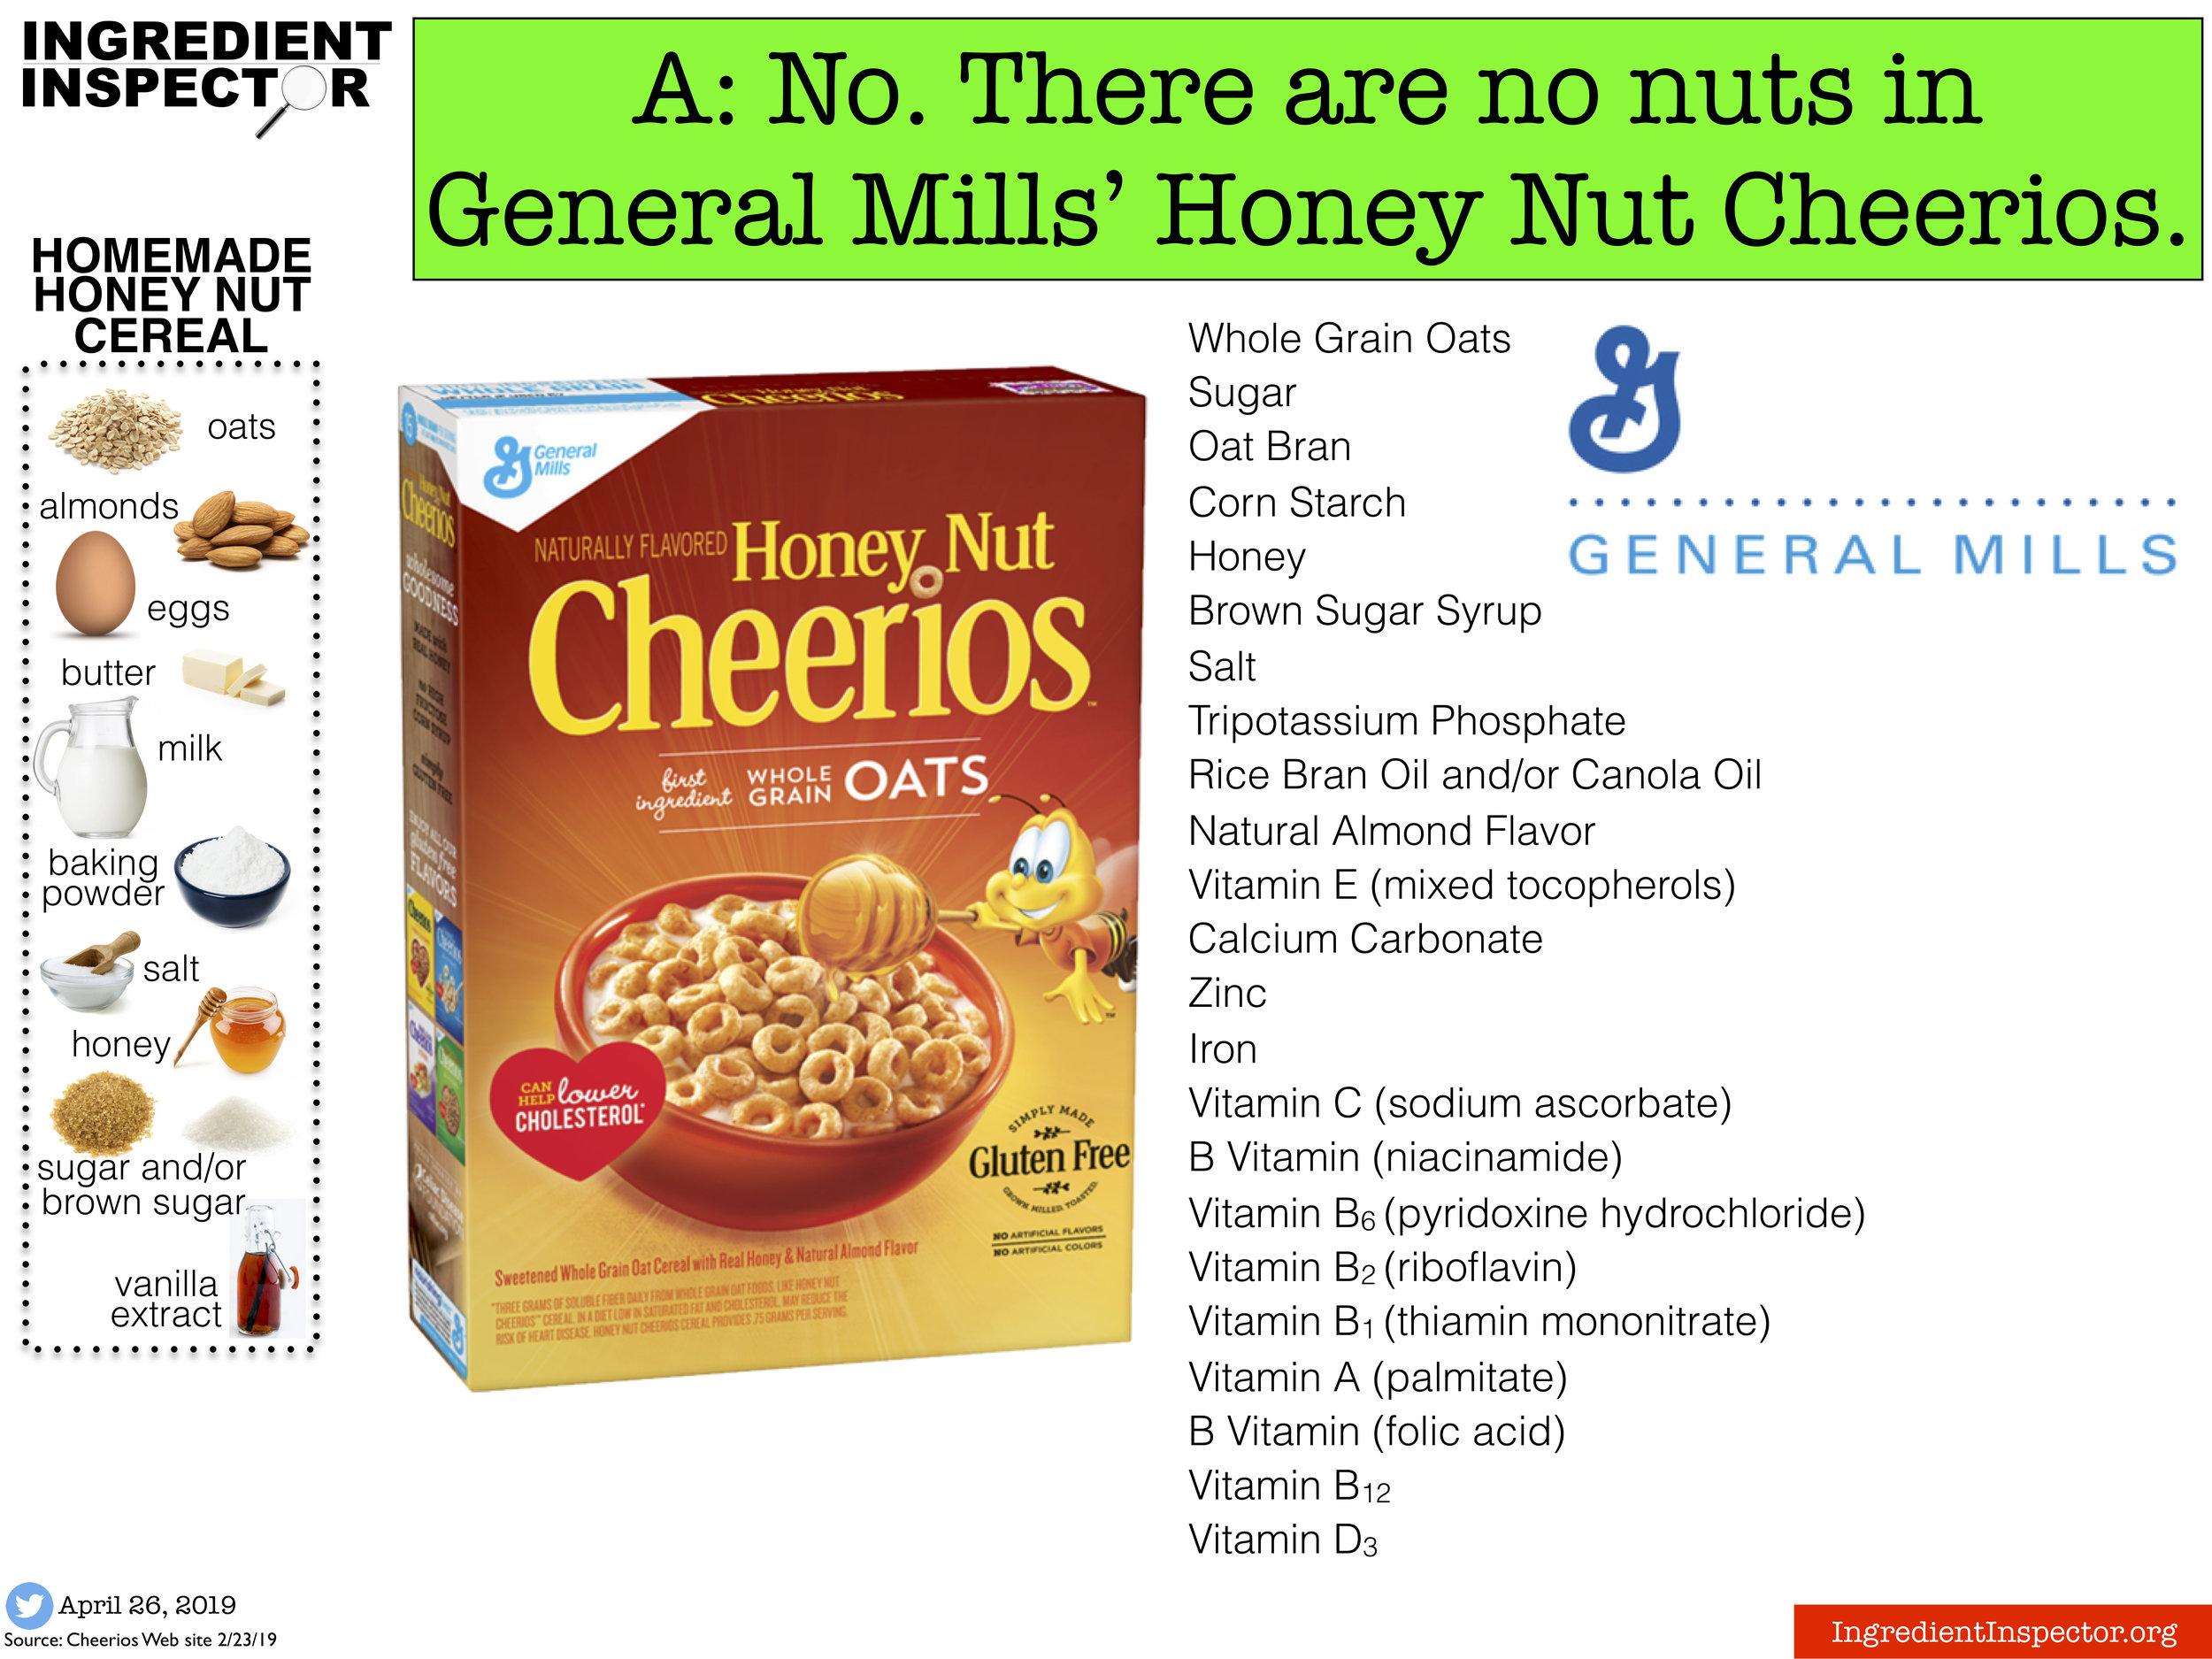 Ingredient Inspector Honey Nut Cheerios have no nuts.jpg